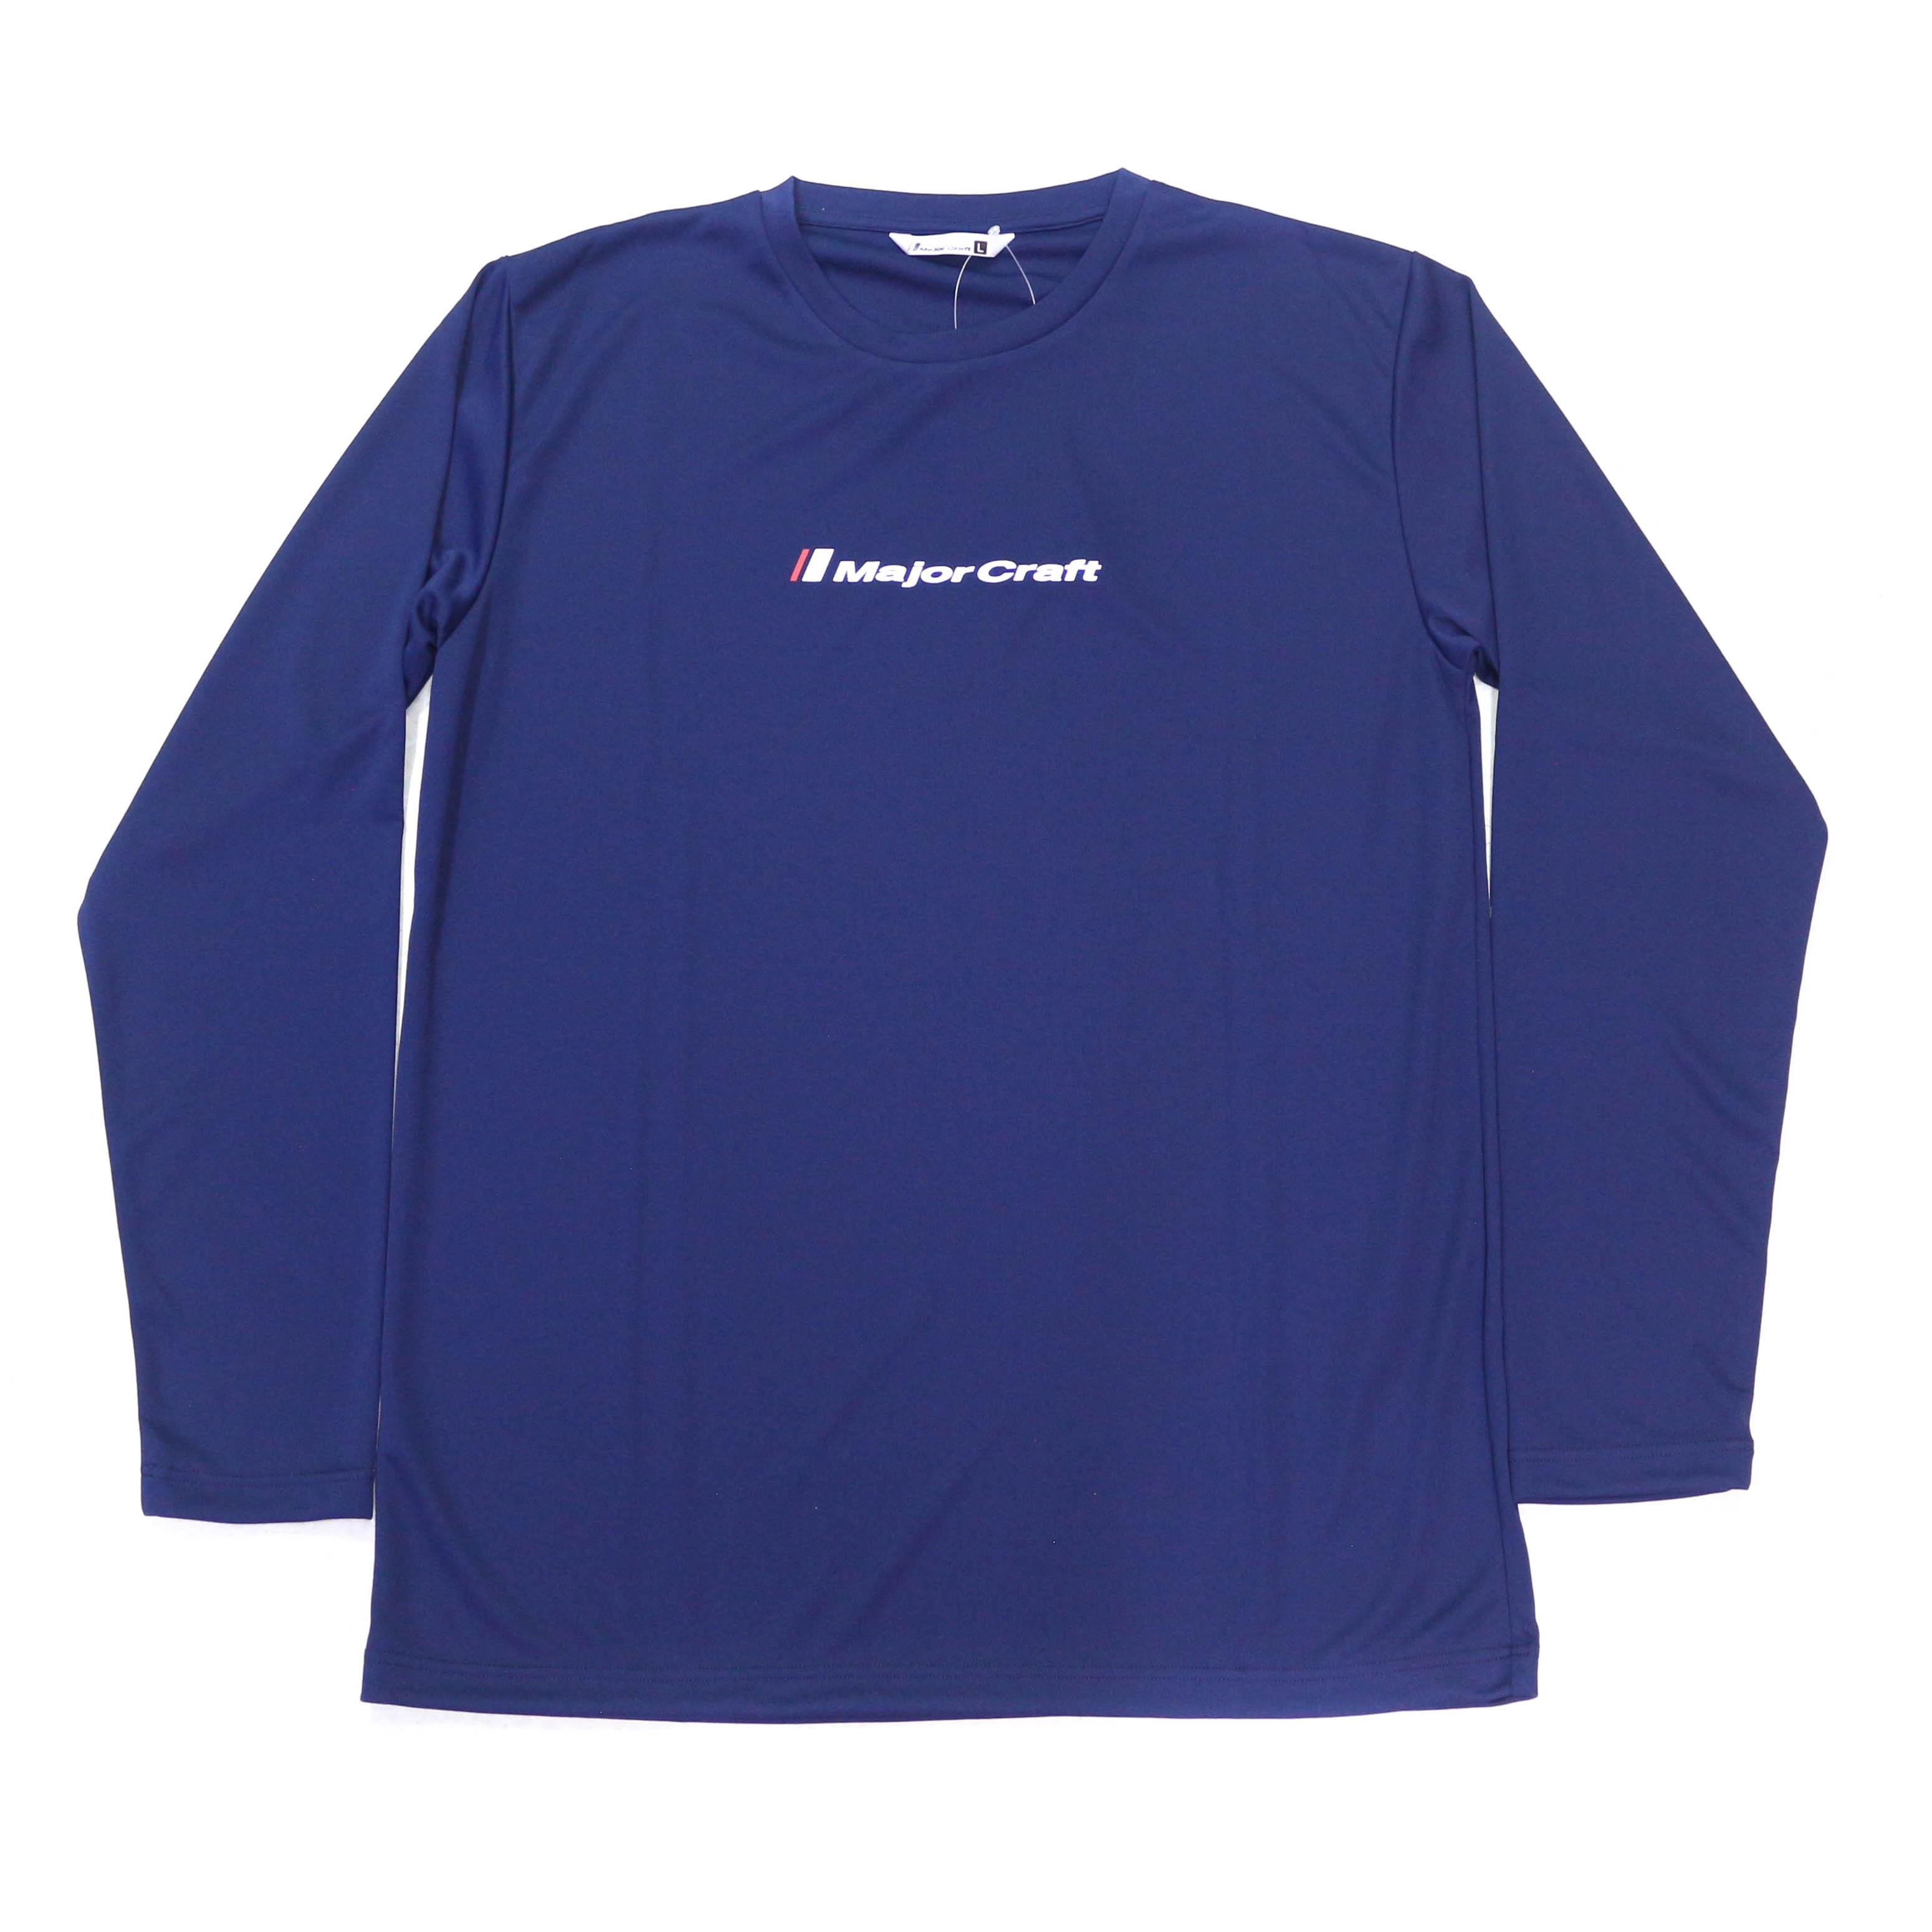 Major Craft T-Shirt Long Sleeve MCW-DLT-M/NV (3062)